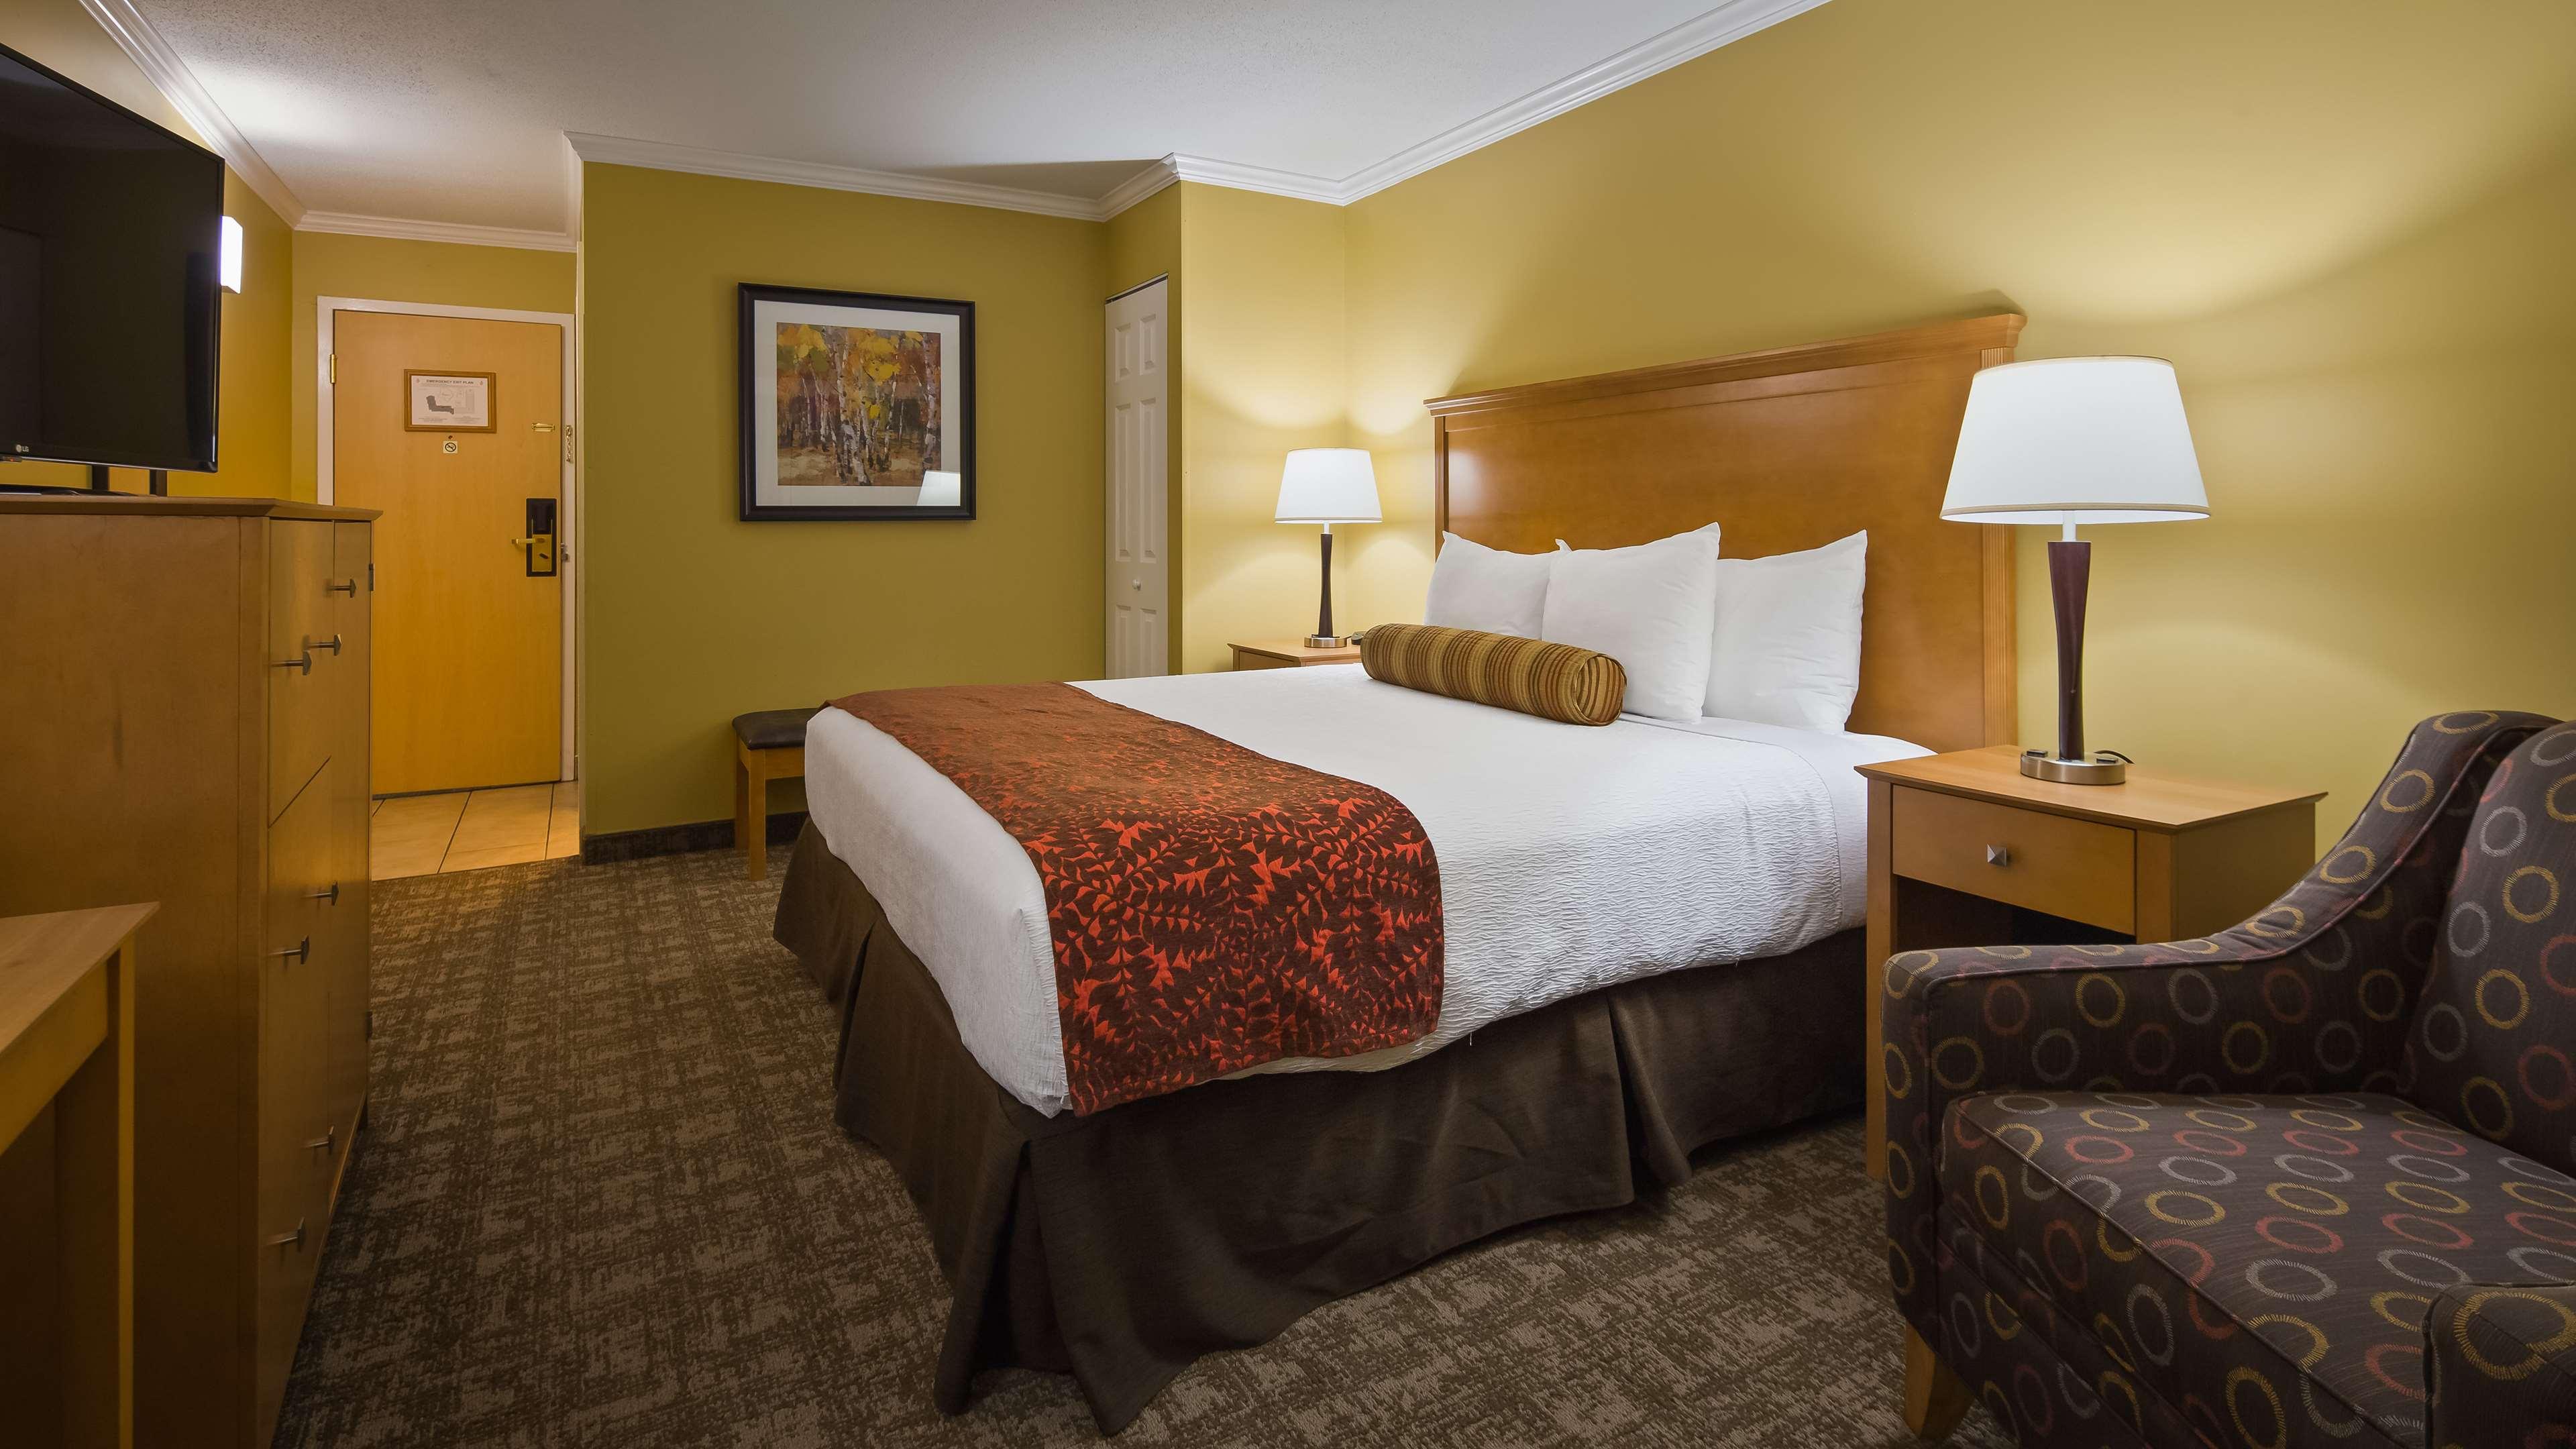 Best Western Plus Windjammer Inn & Conference Center image 25